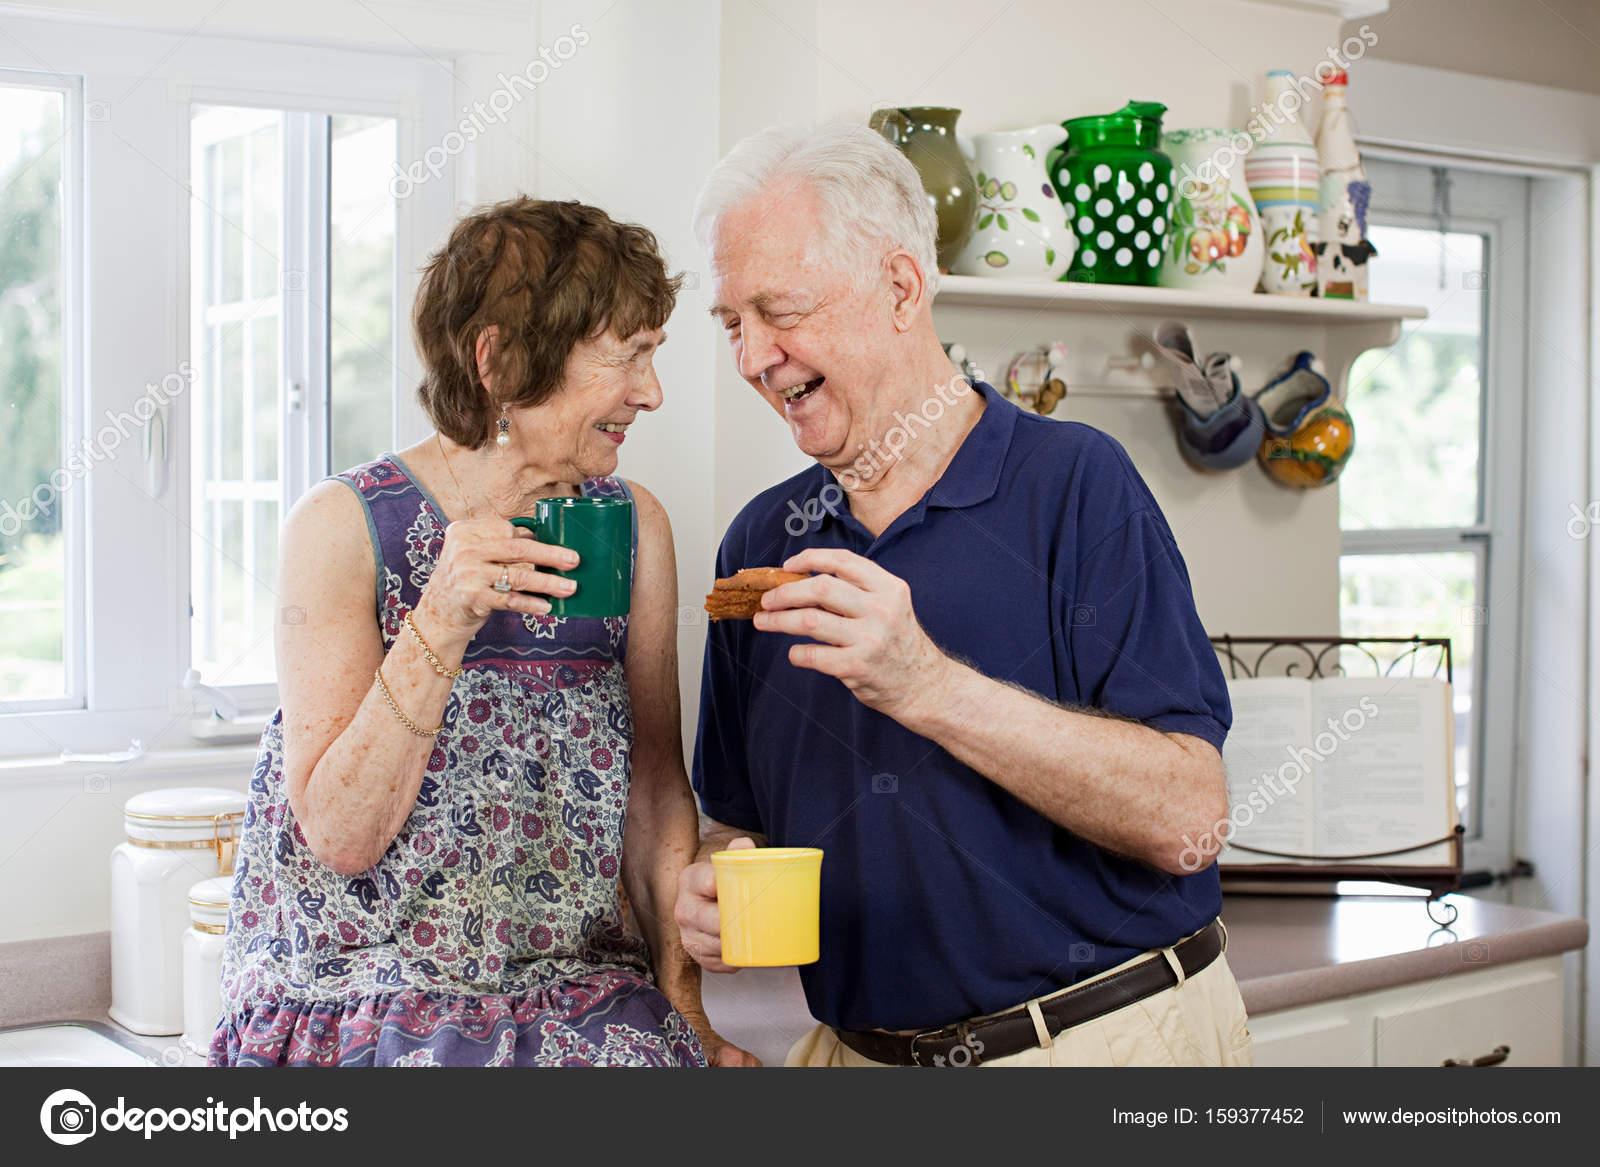 The United States Ukrainian Senior Online Dating Website